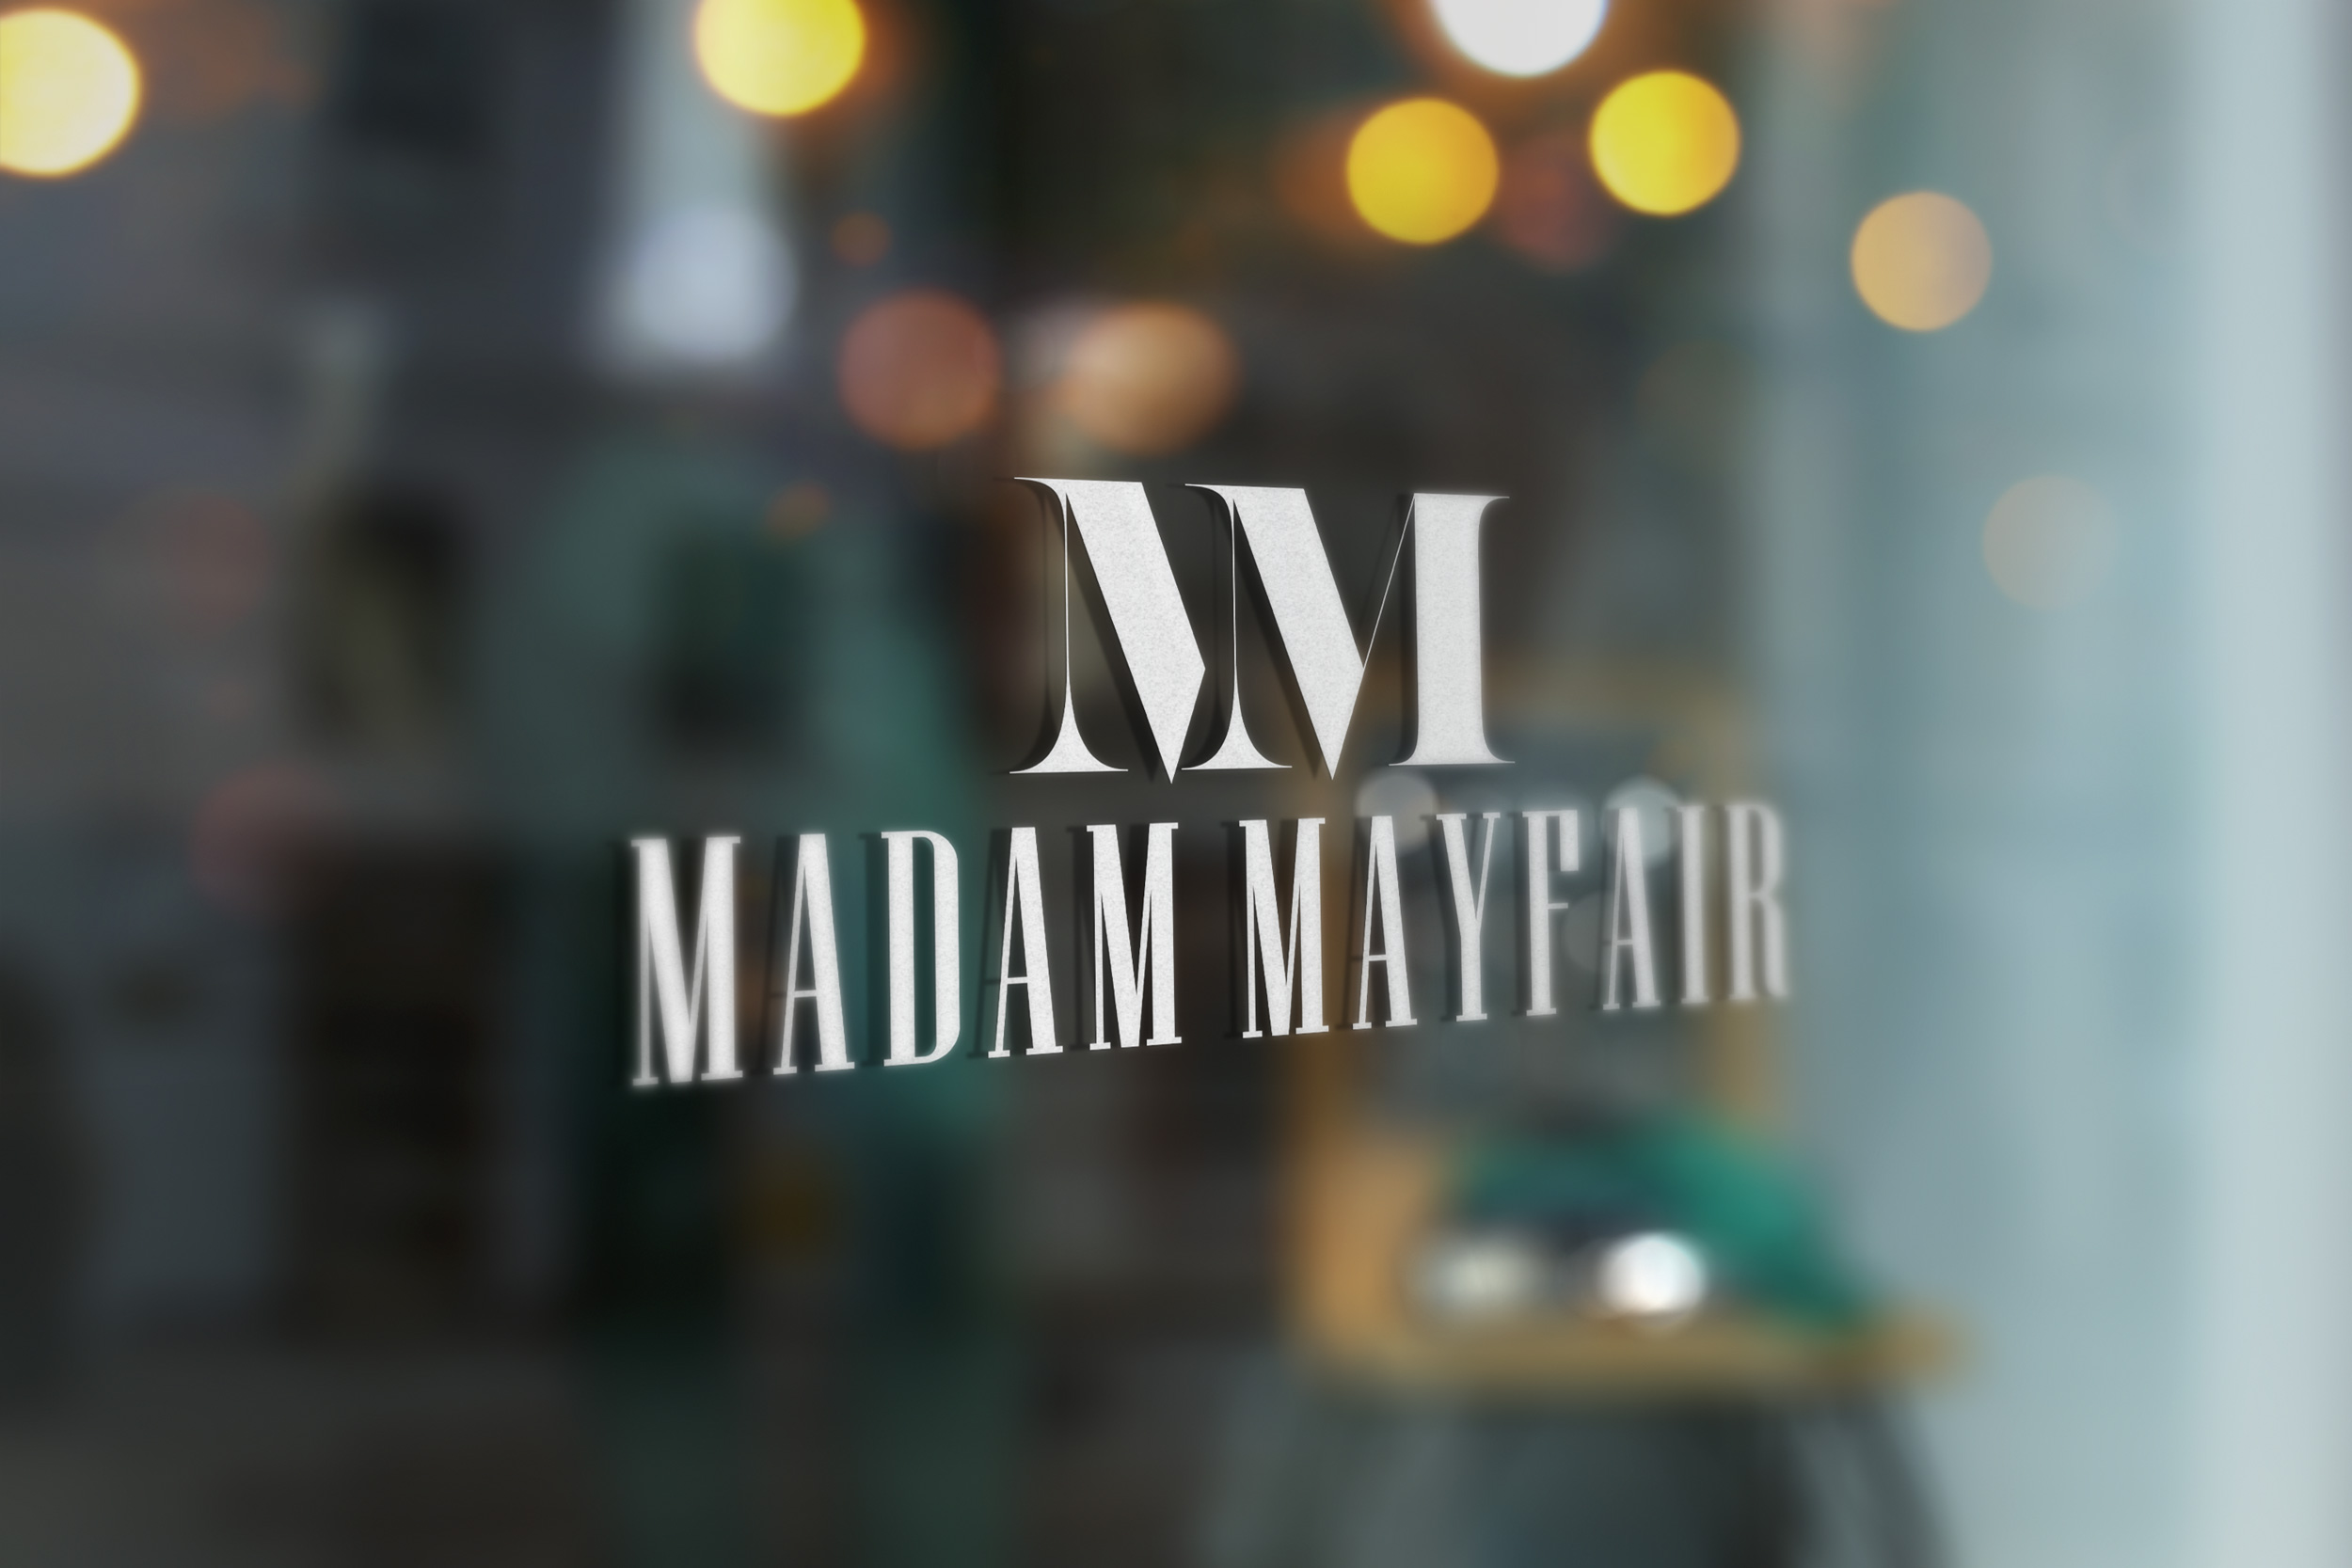 madam mayfair logo design by Carl Gamble